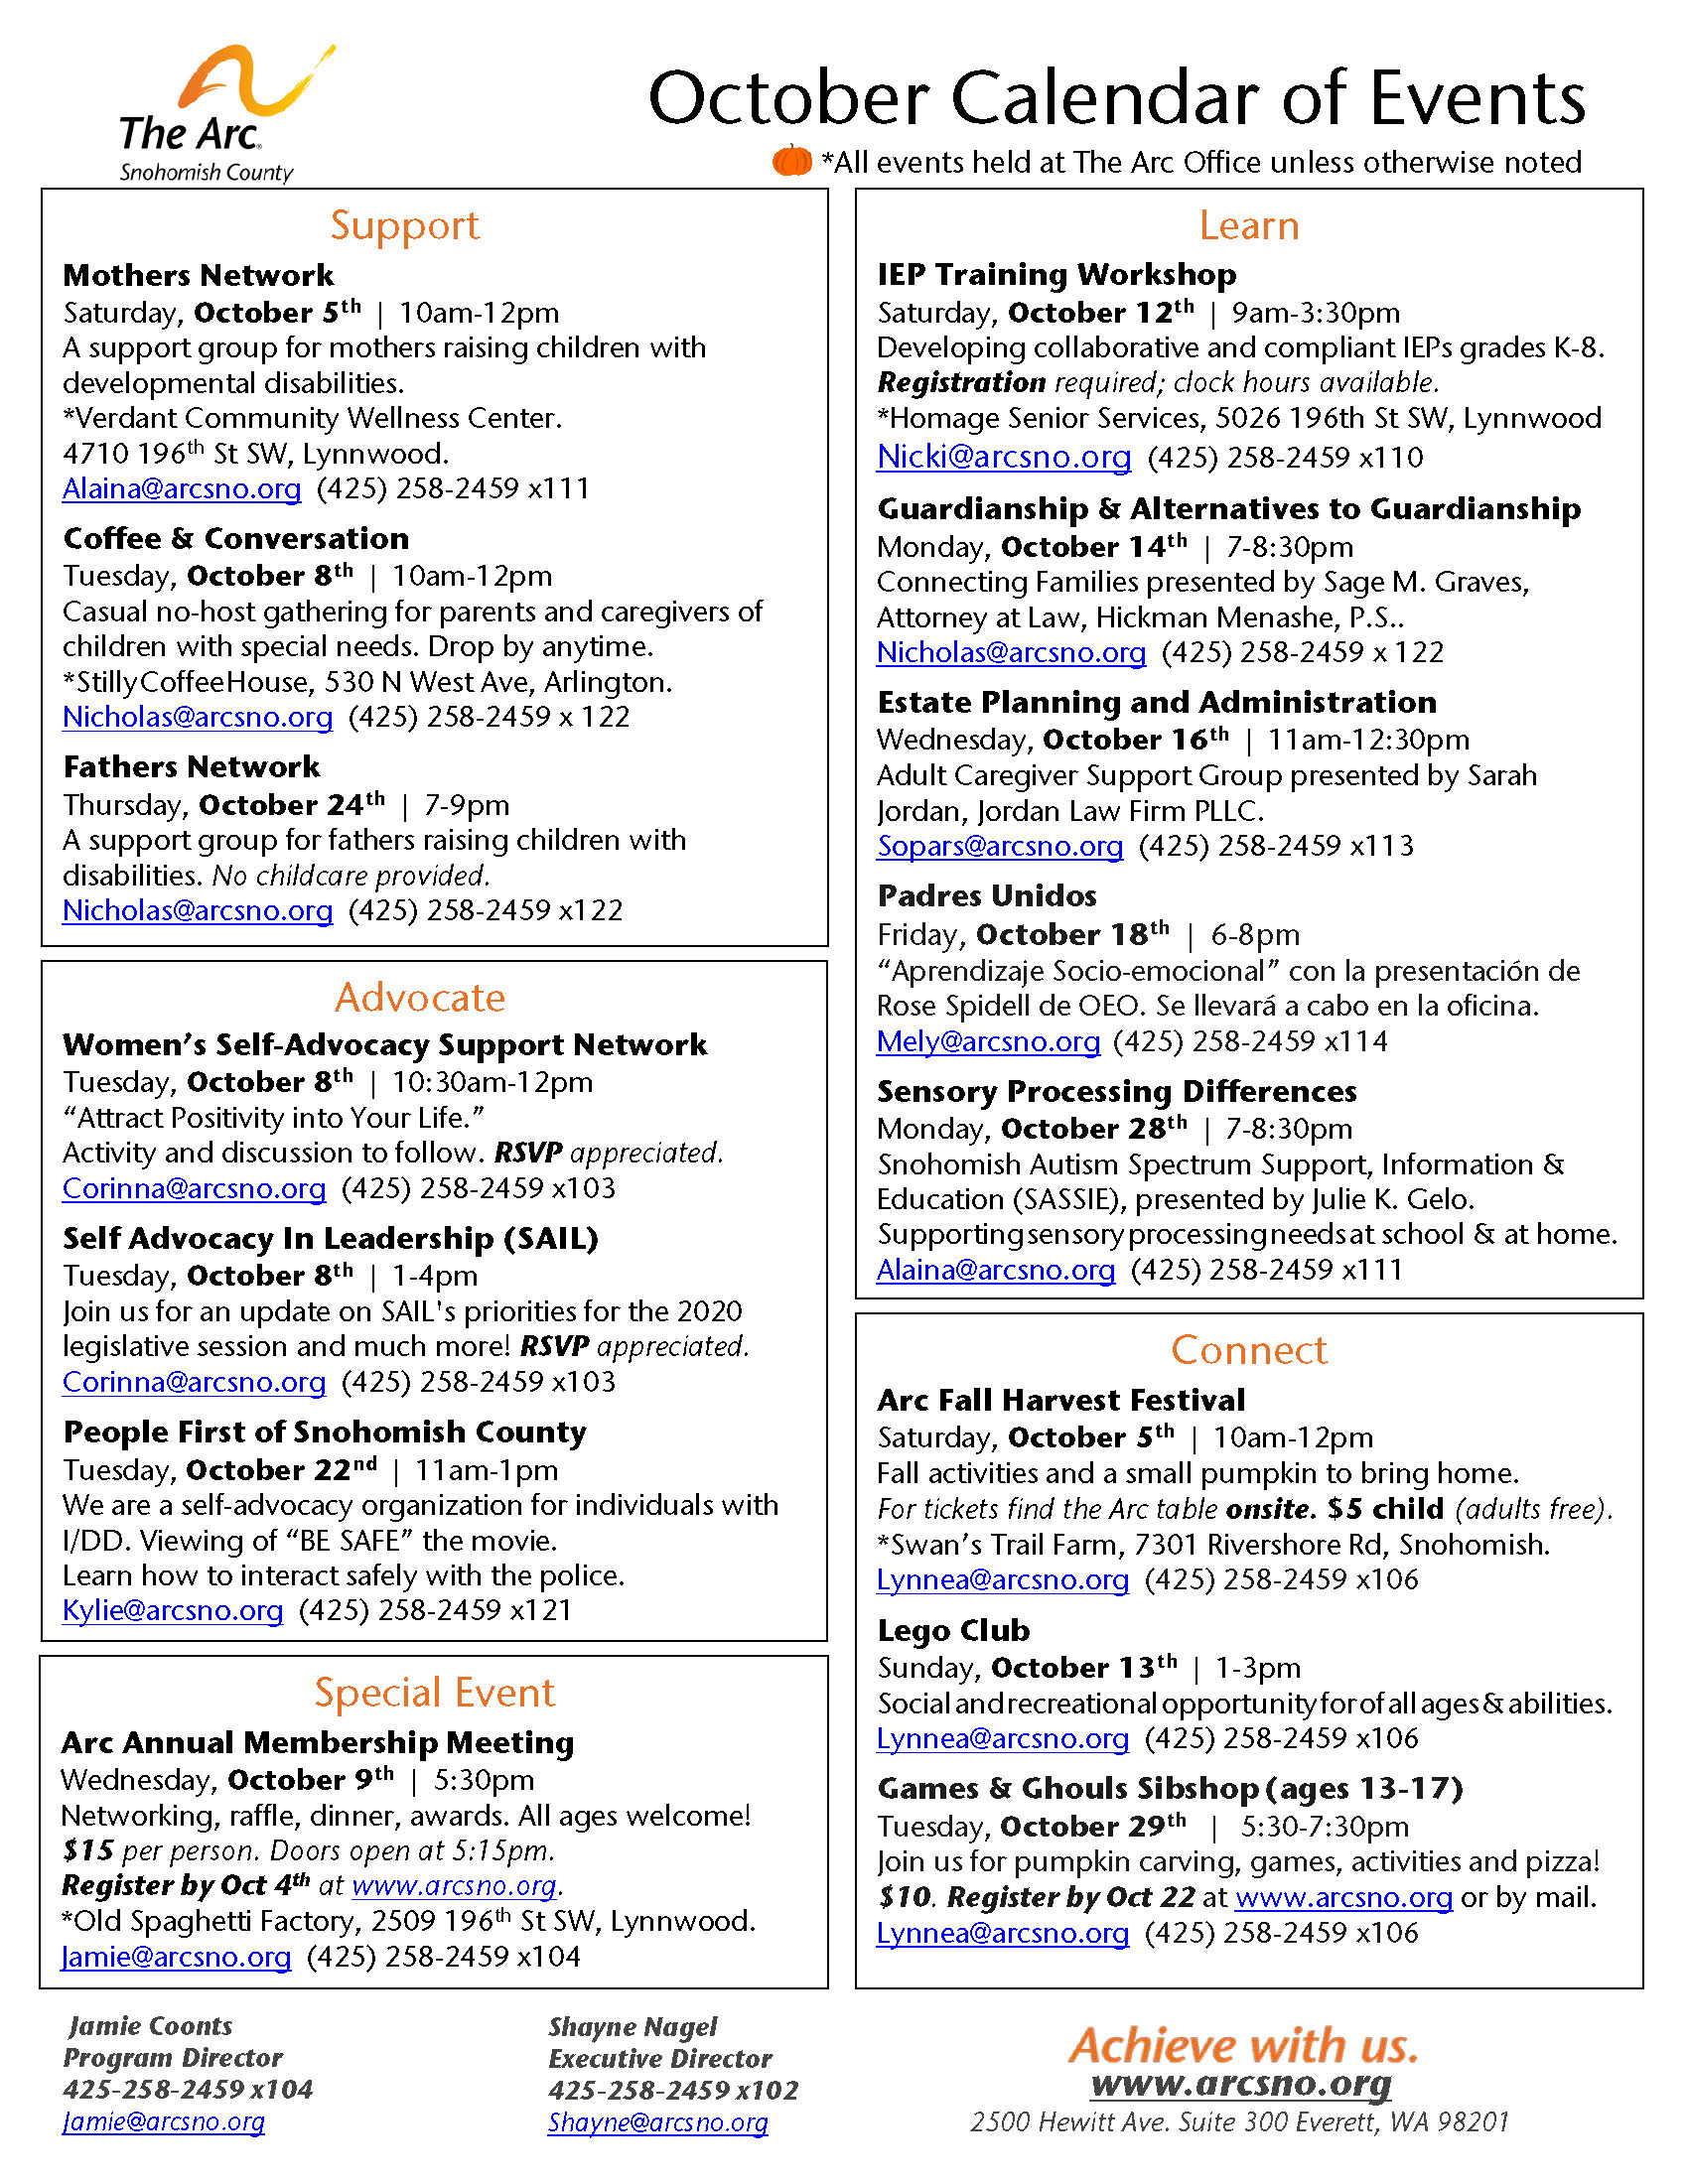 The Arc October Calendar of Events